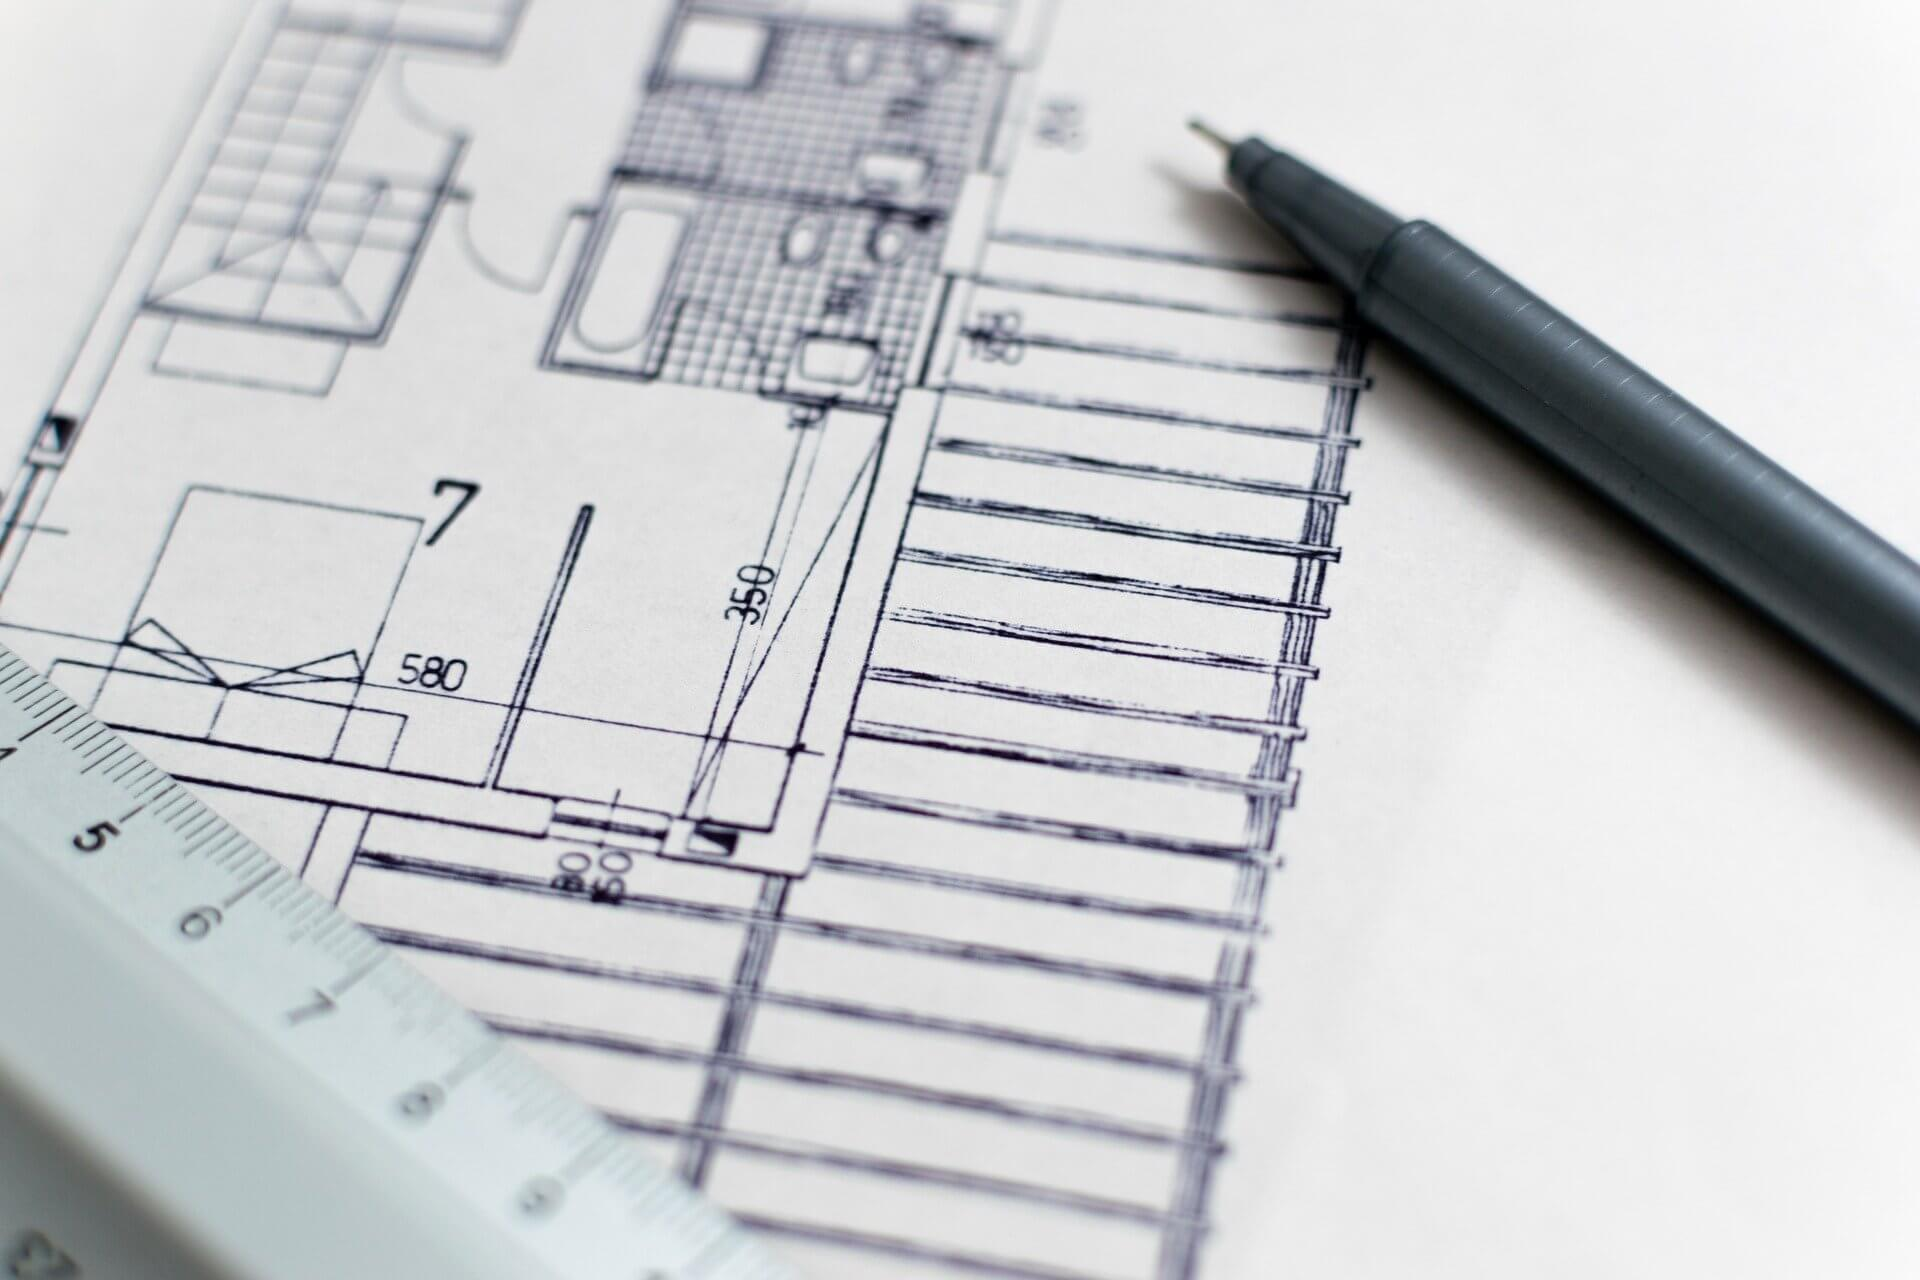 architecture-1857175_1920 内装工事をお考えの方は必見!デザイン料の算出方法をご紹介!